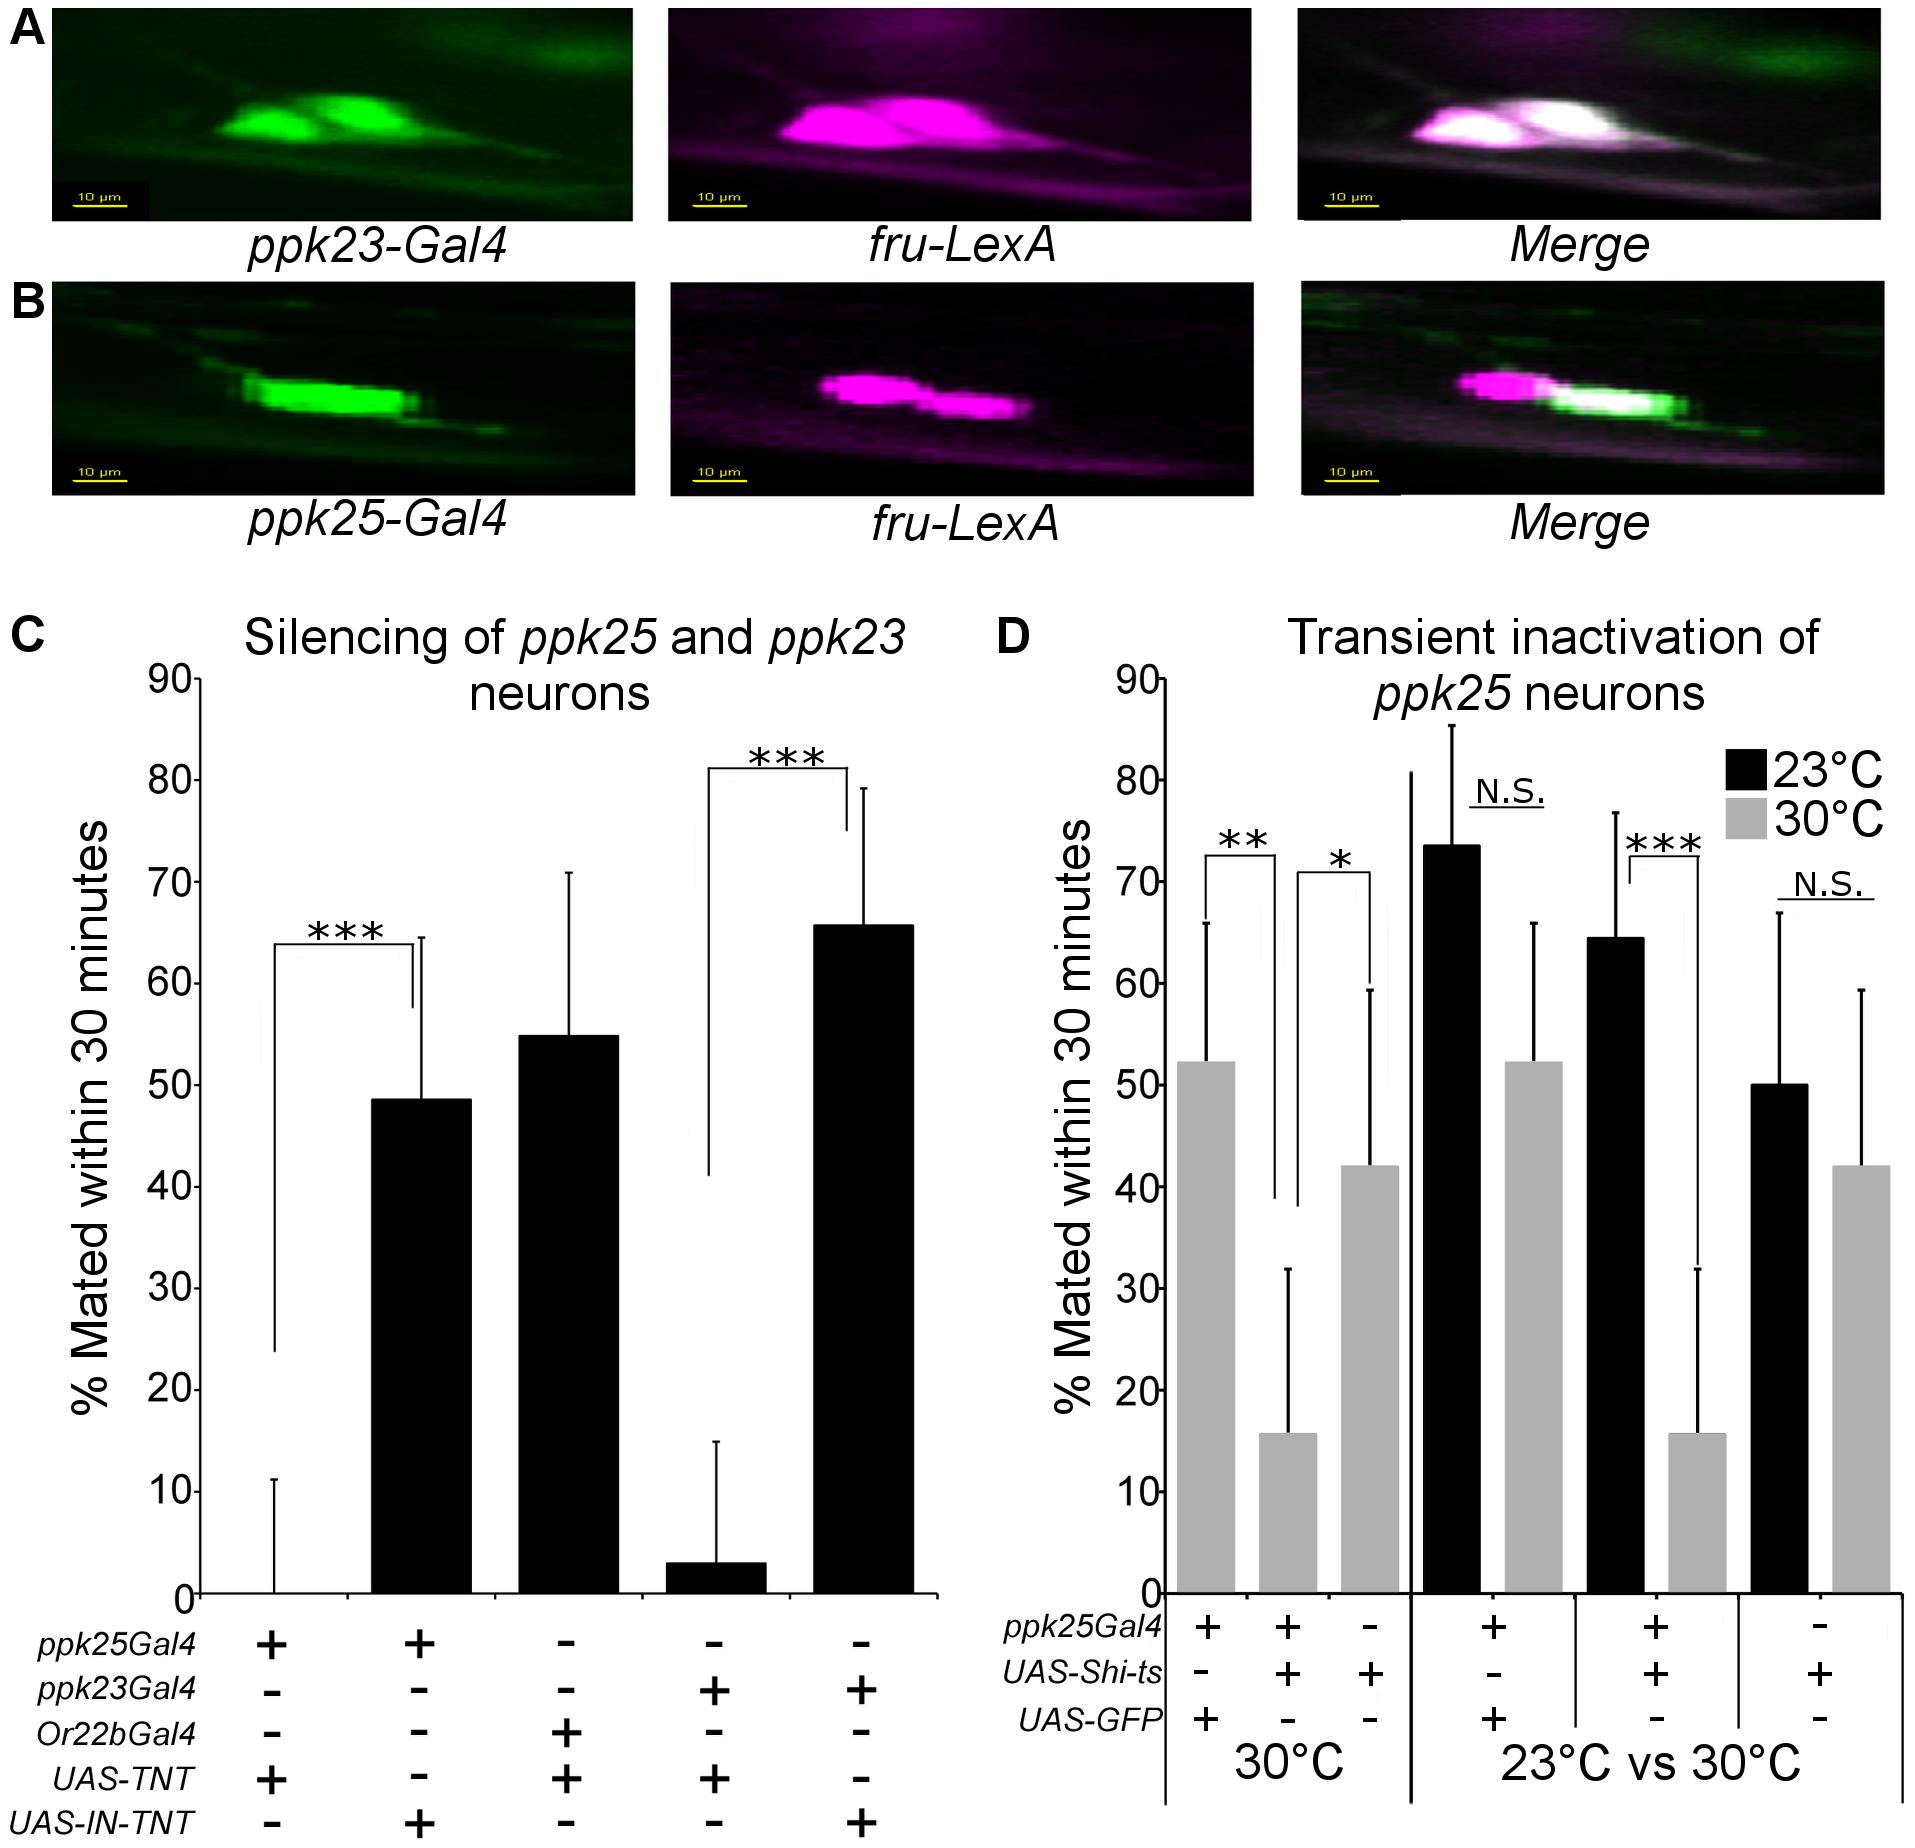 Female <i>ppk25-Gal4</i> neurons represent a subset of <i>ppk23-Gal4</i> neurons and are involved in female receptivity.